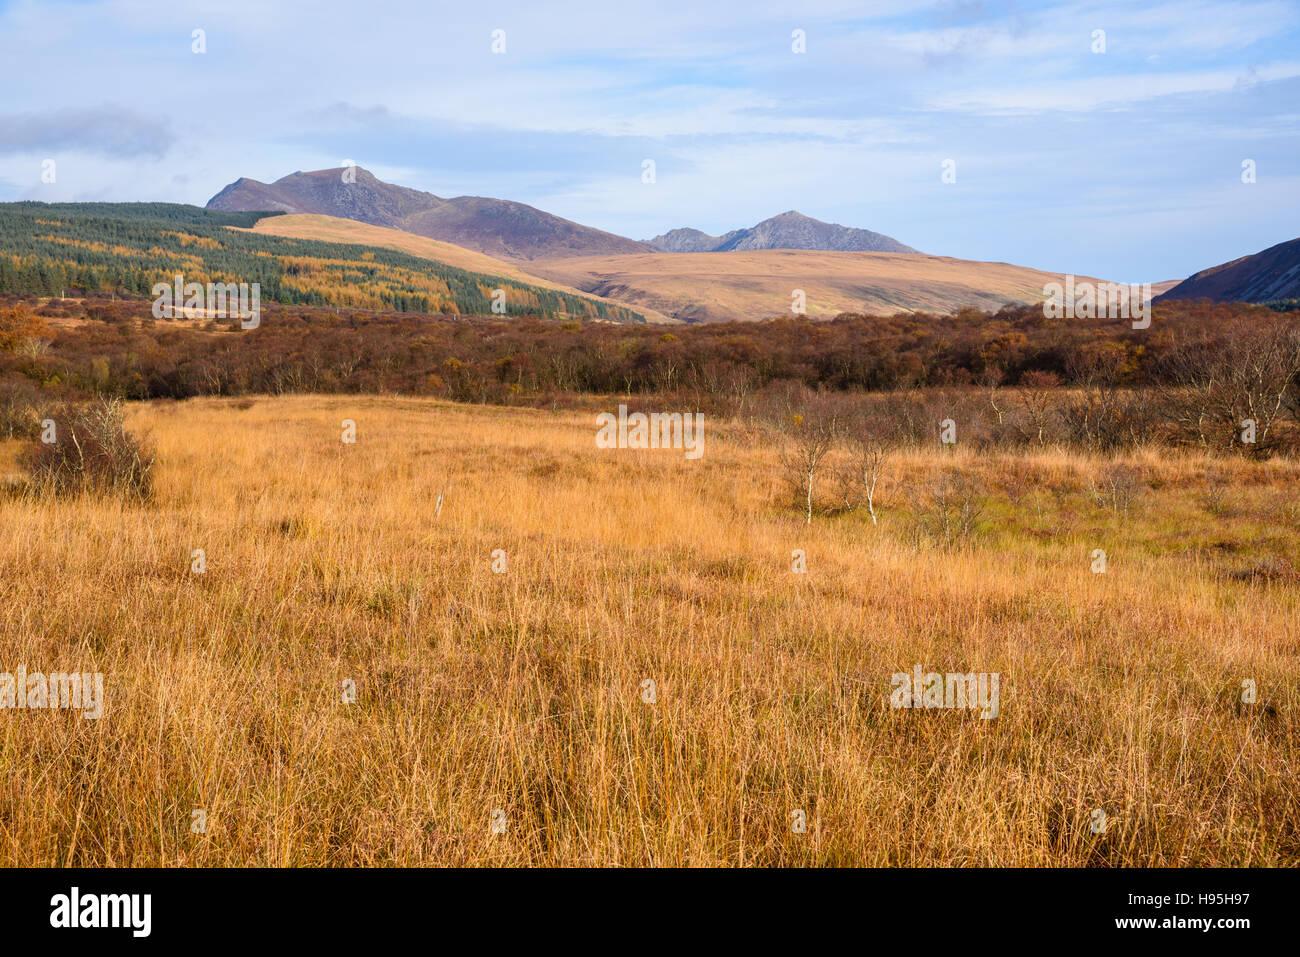 Machrie Moor stone circles, Isle of Arran, North Ayrshire, Scotland - Stock Image